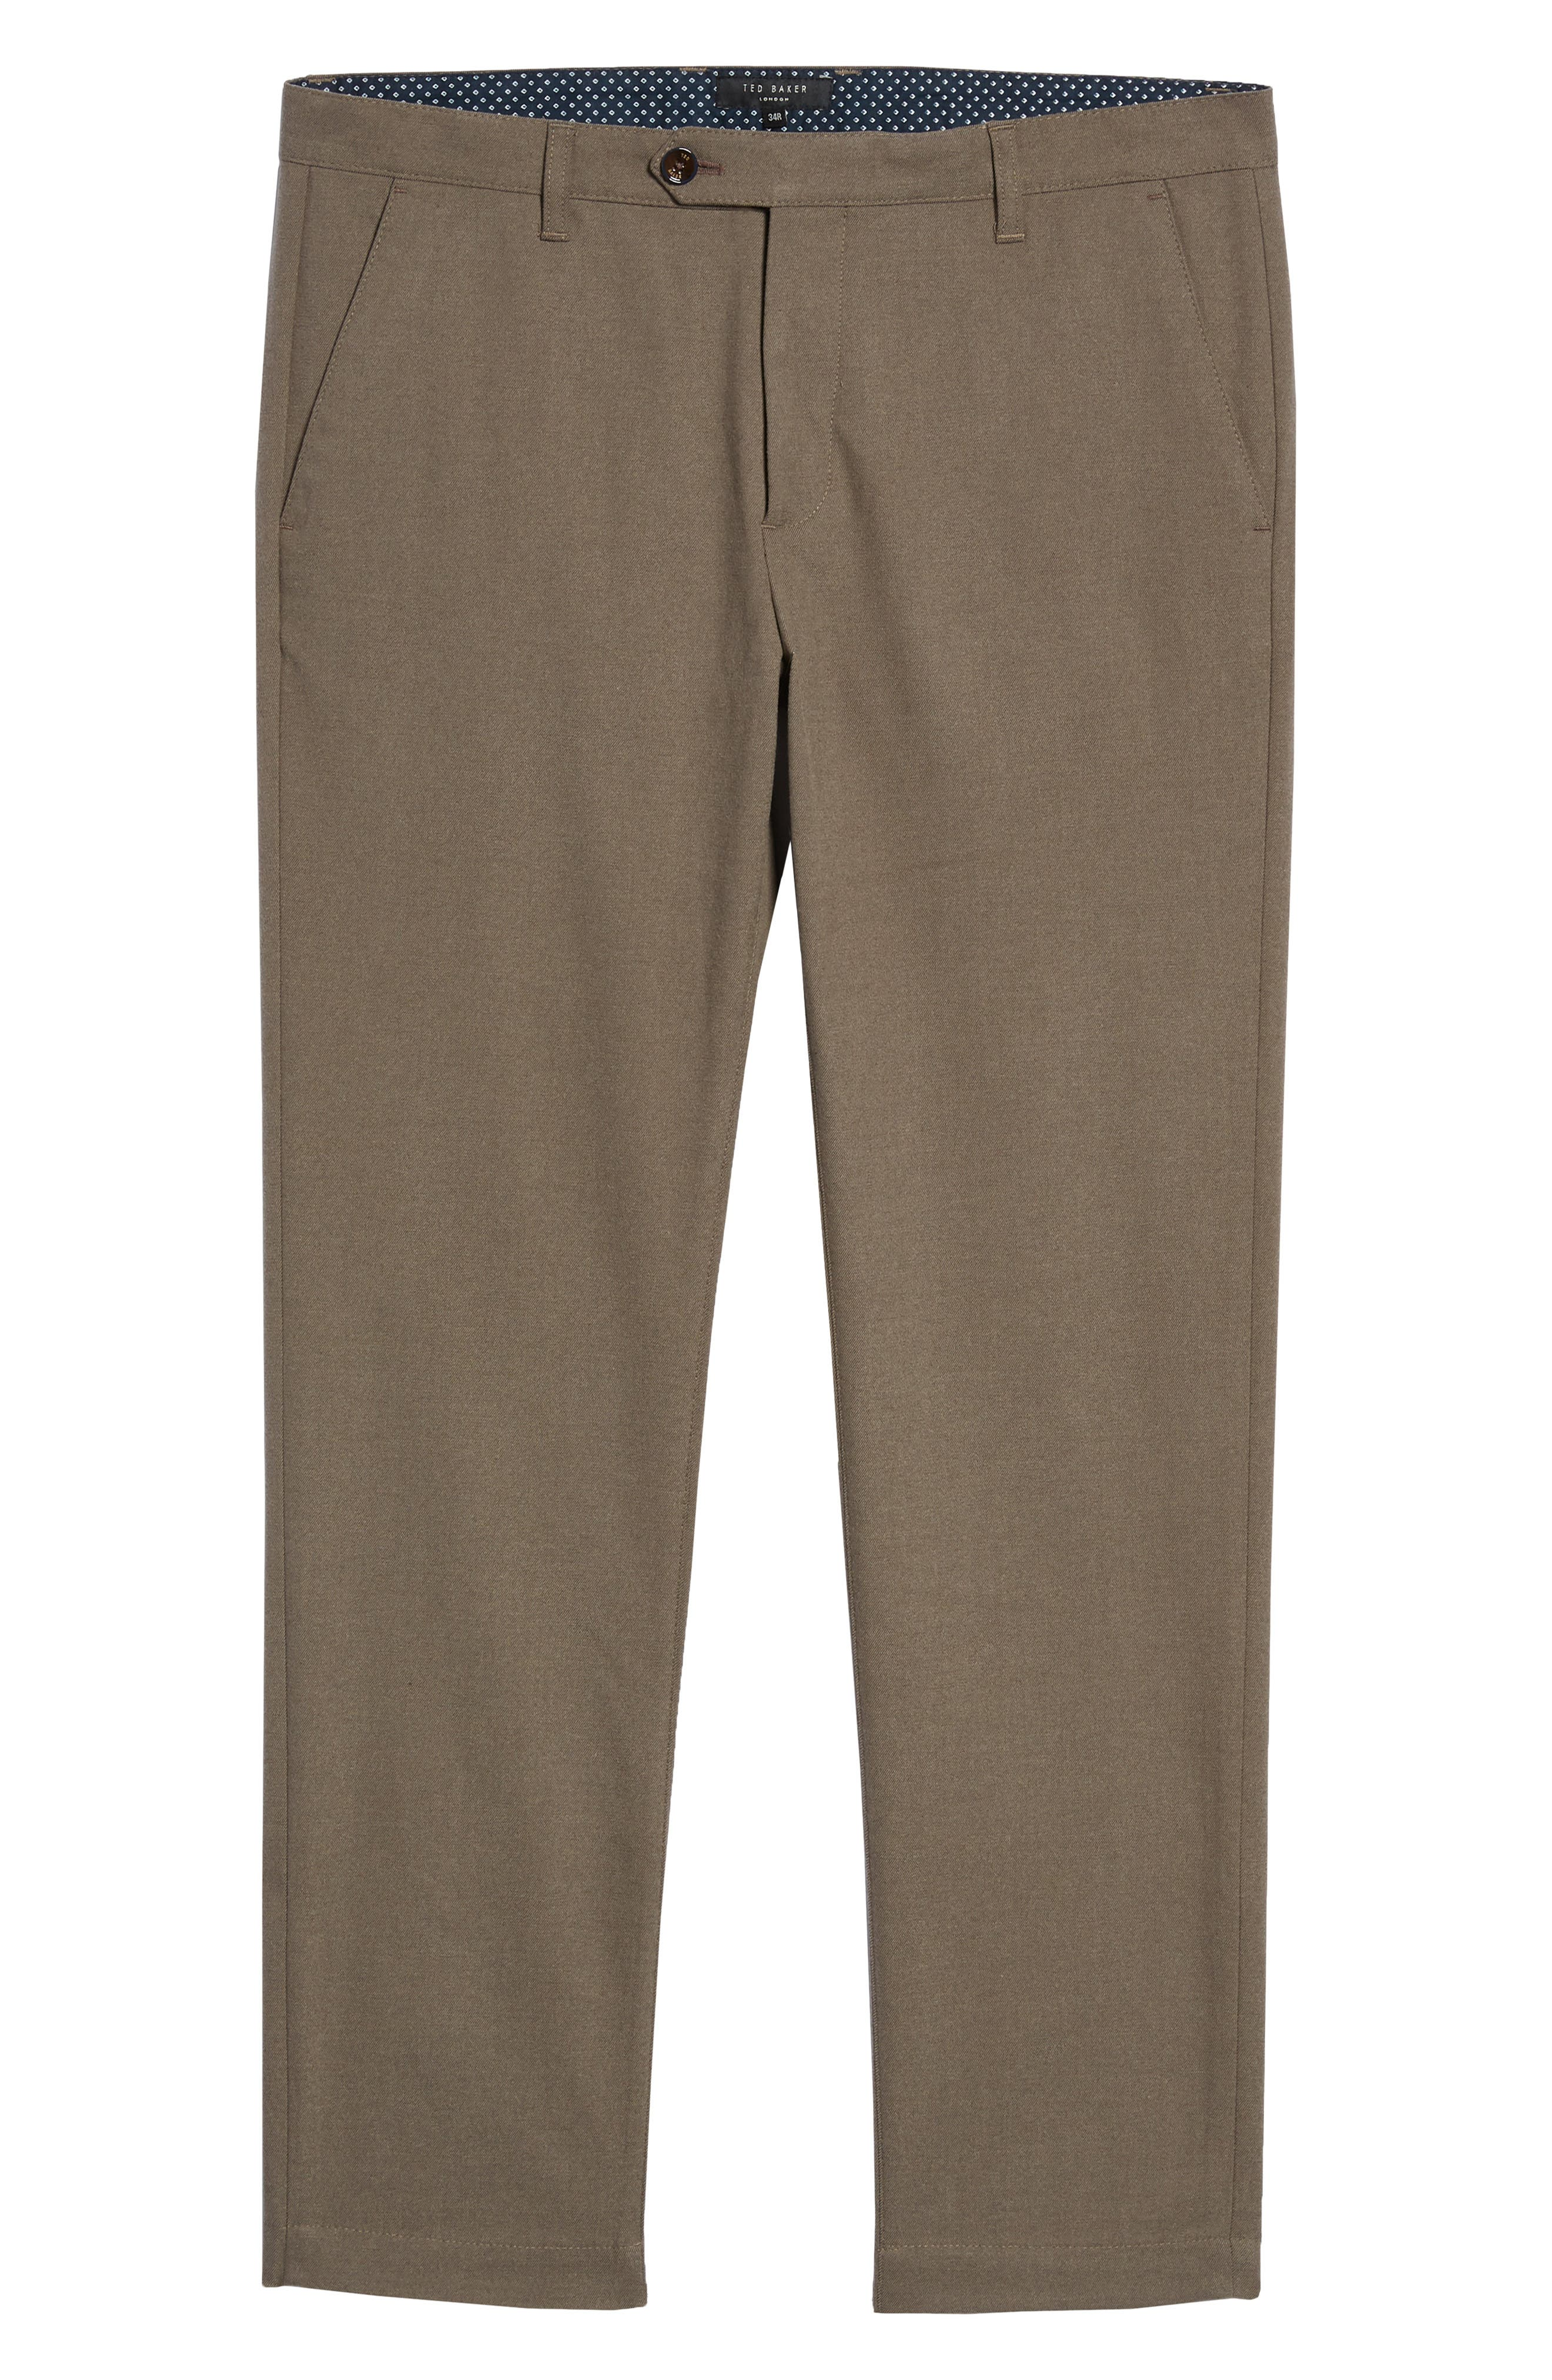 Semplin Slim Fit Brushed Trousers,                             Alternate thumbnail 6, color,                             NATURAL